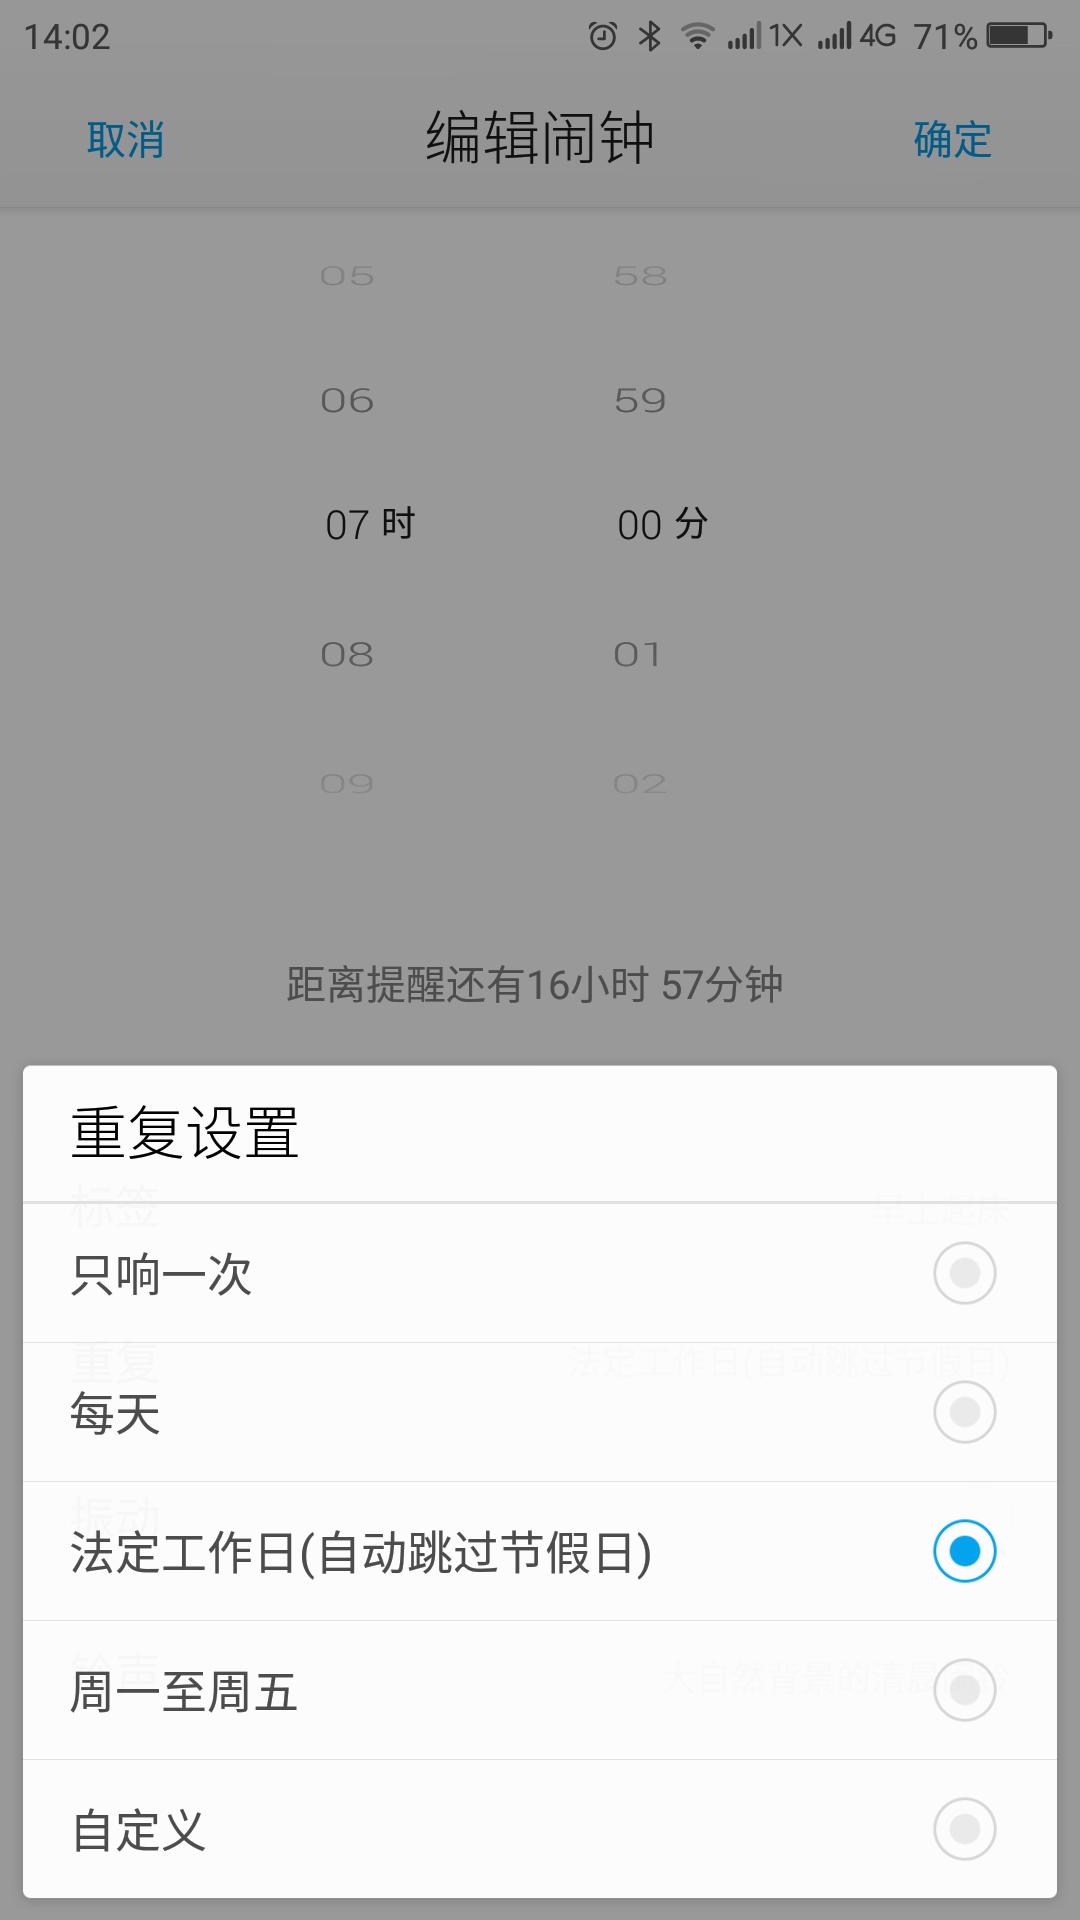 Screenshot_2016-03-28-14-02-37.png